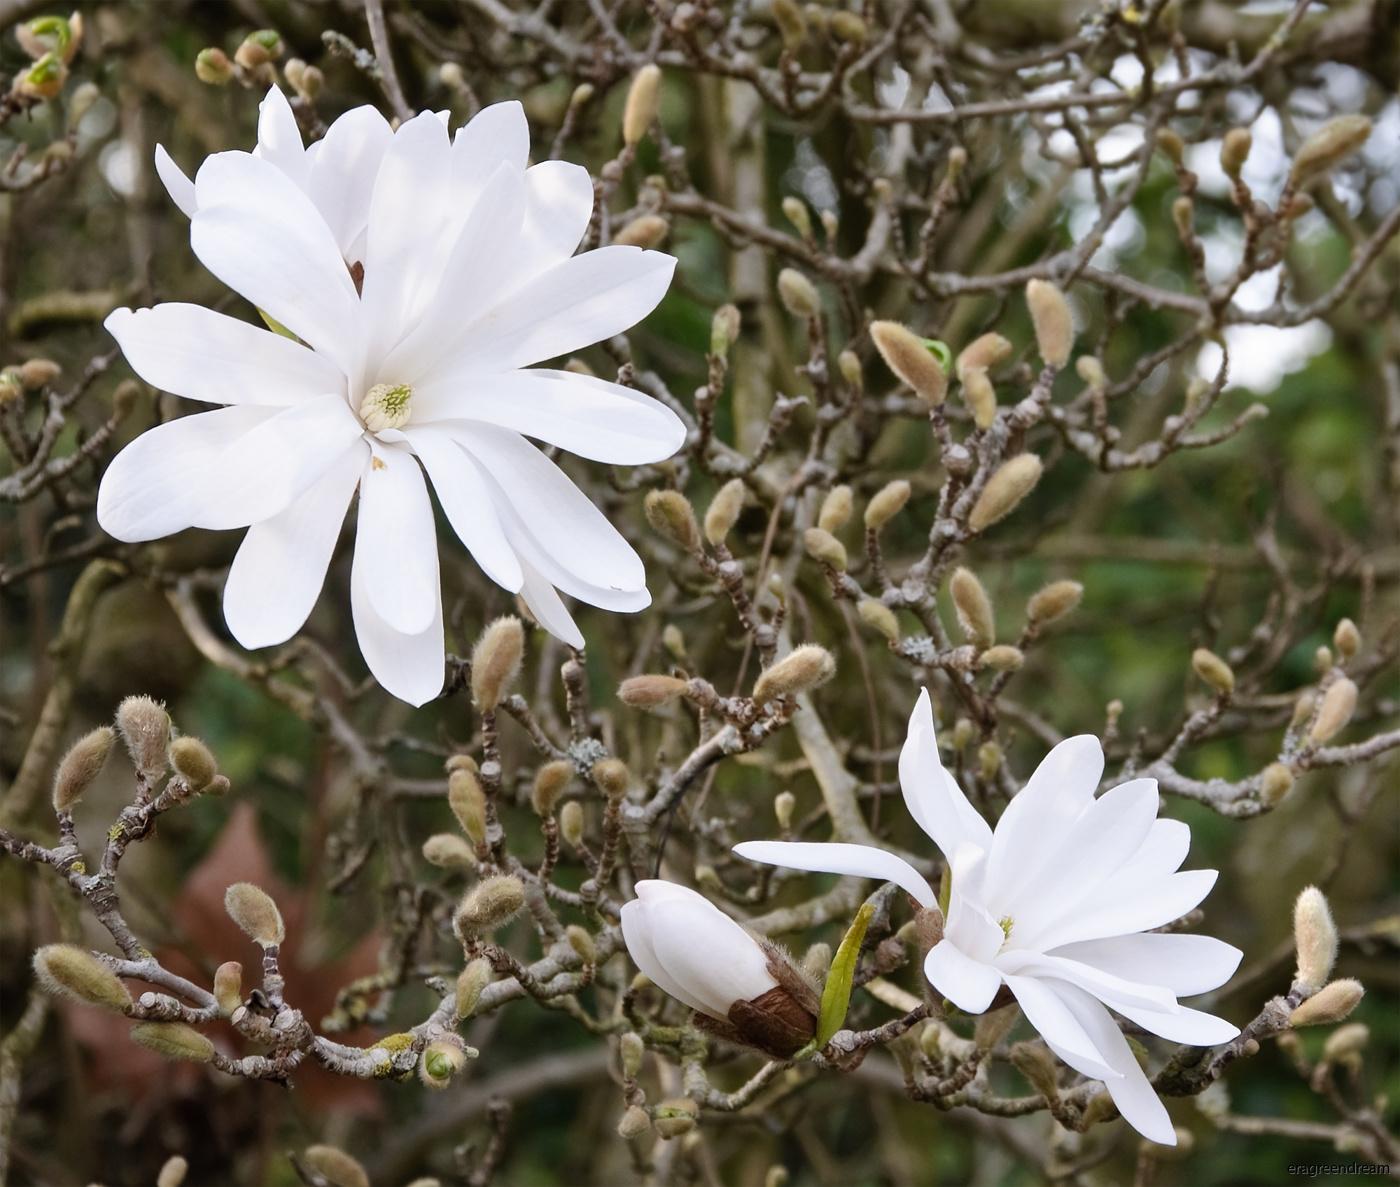 Magnolia stellata blomma